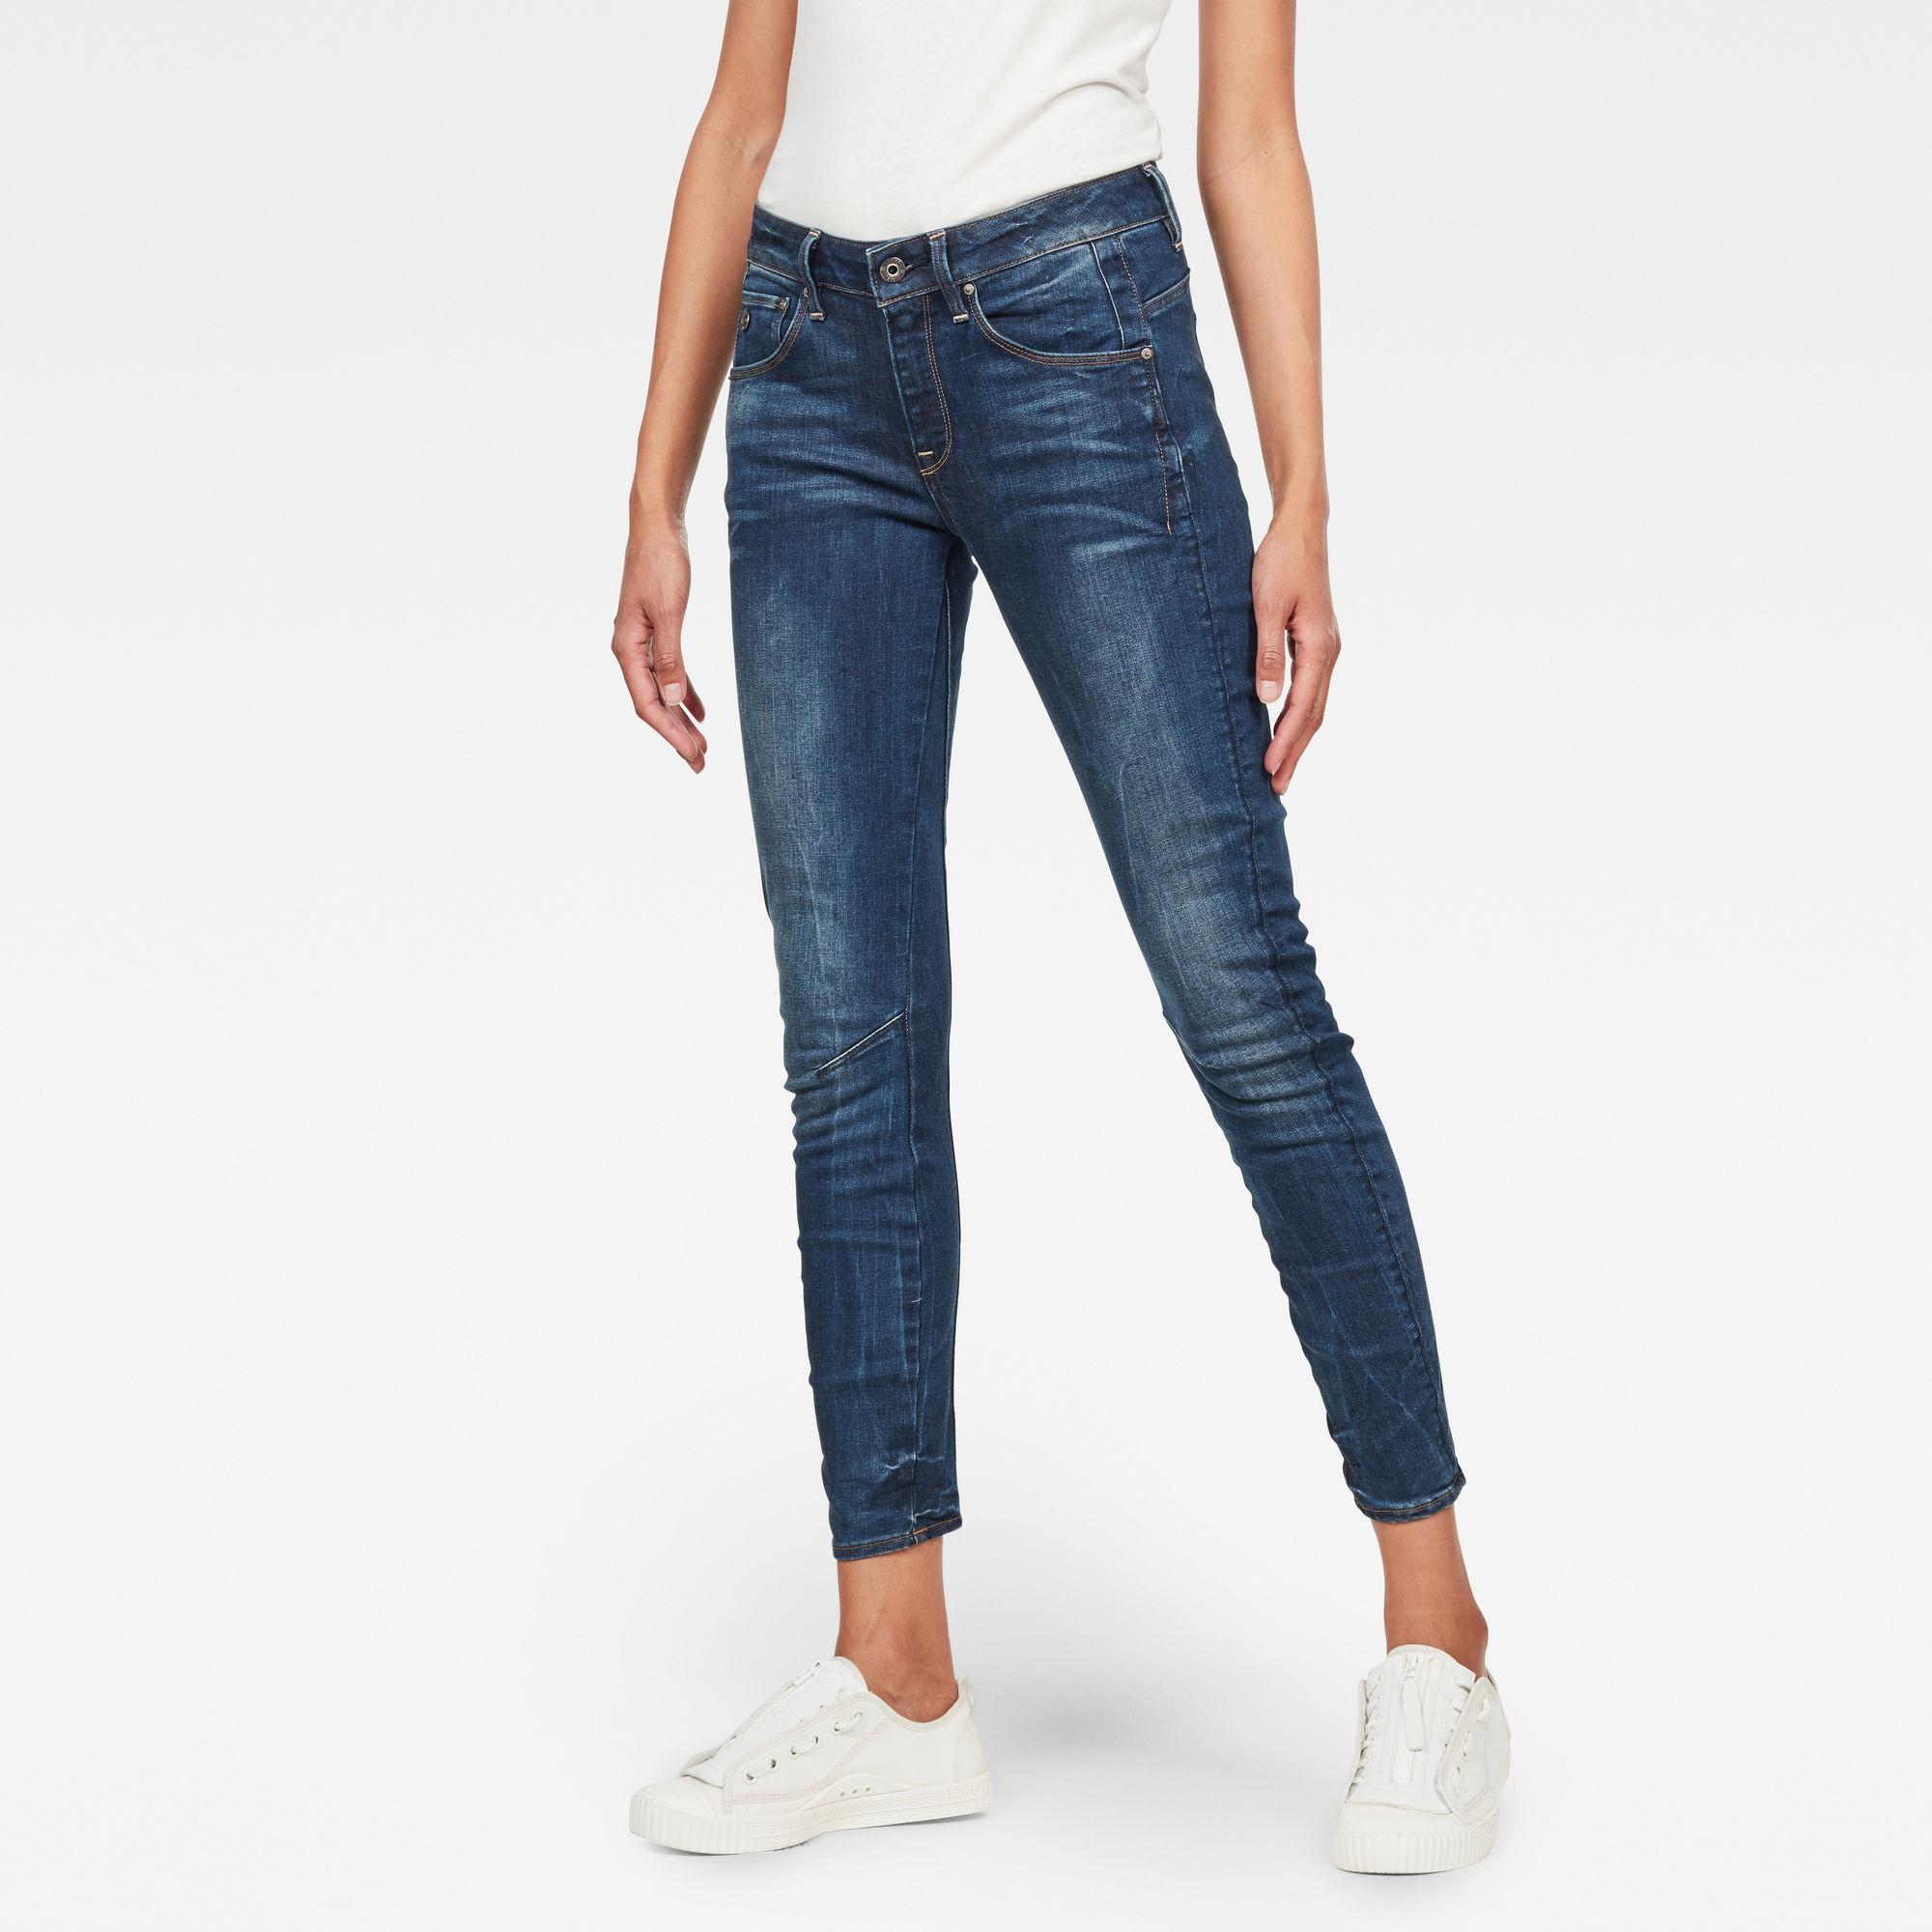 G-Star RAW Dames Arc 3D Mid Skinny Jeans Donkerblauw